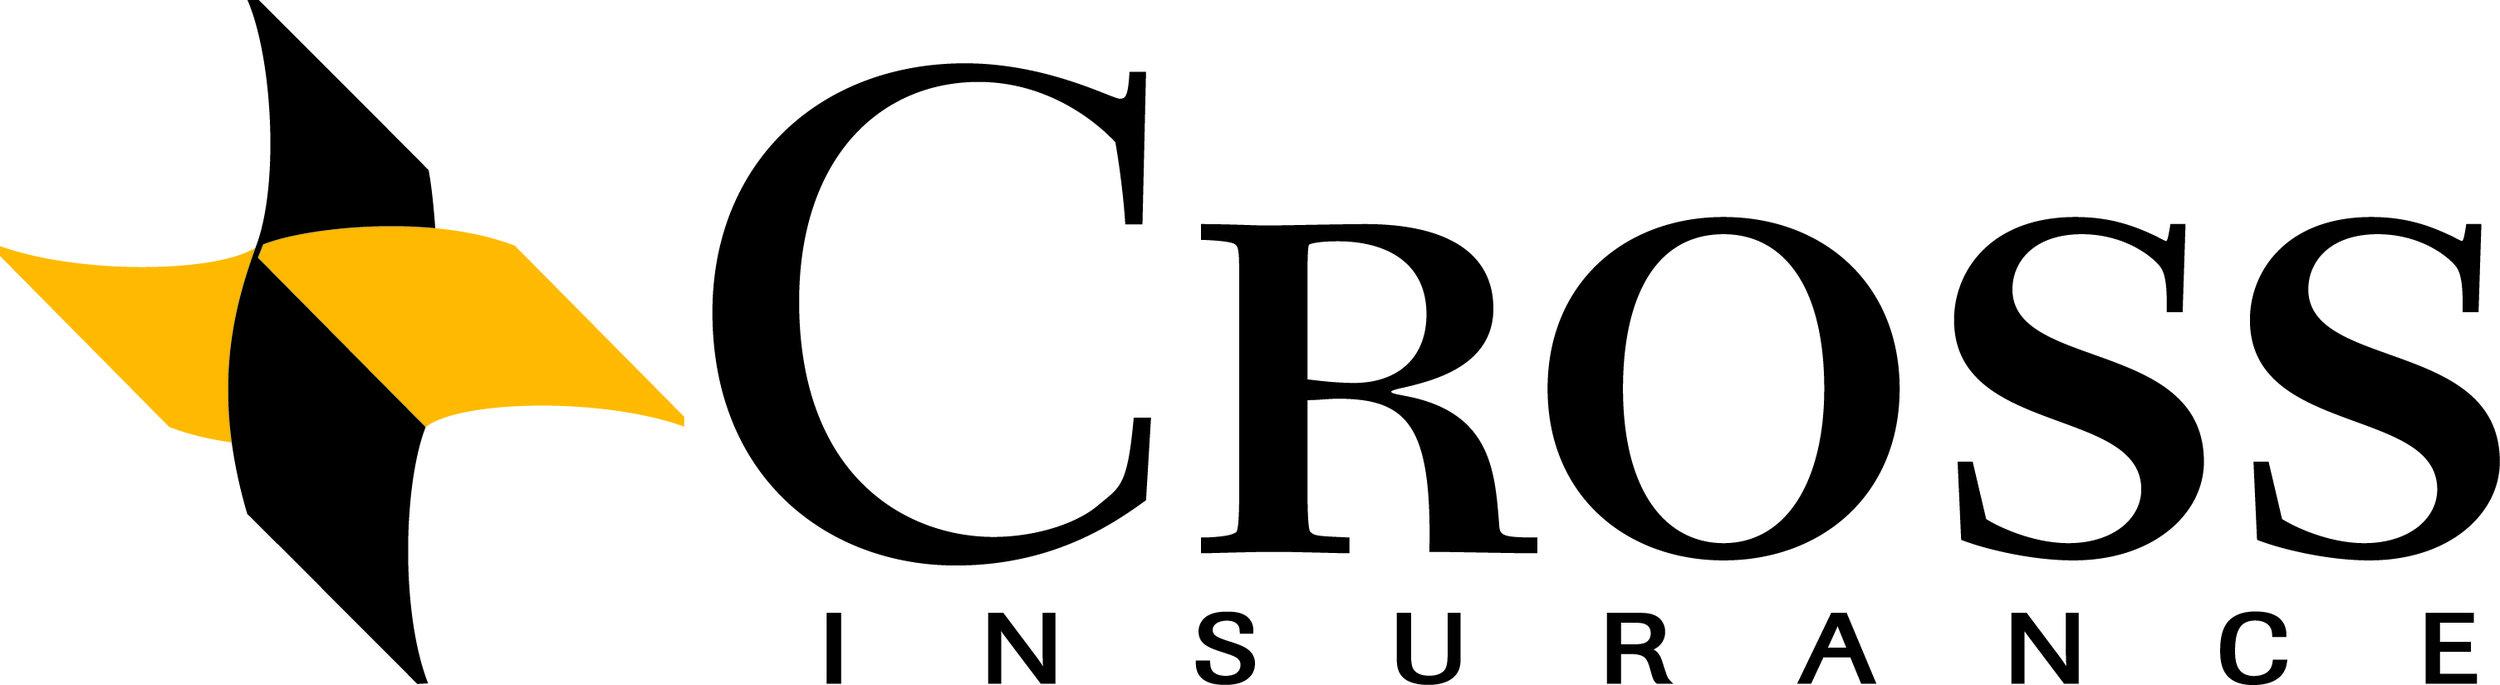 Cross Logo 062015.jpg